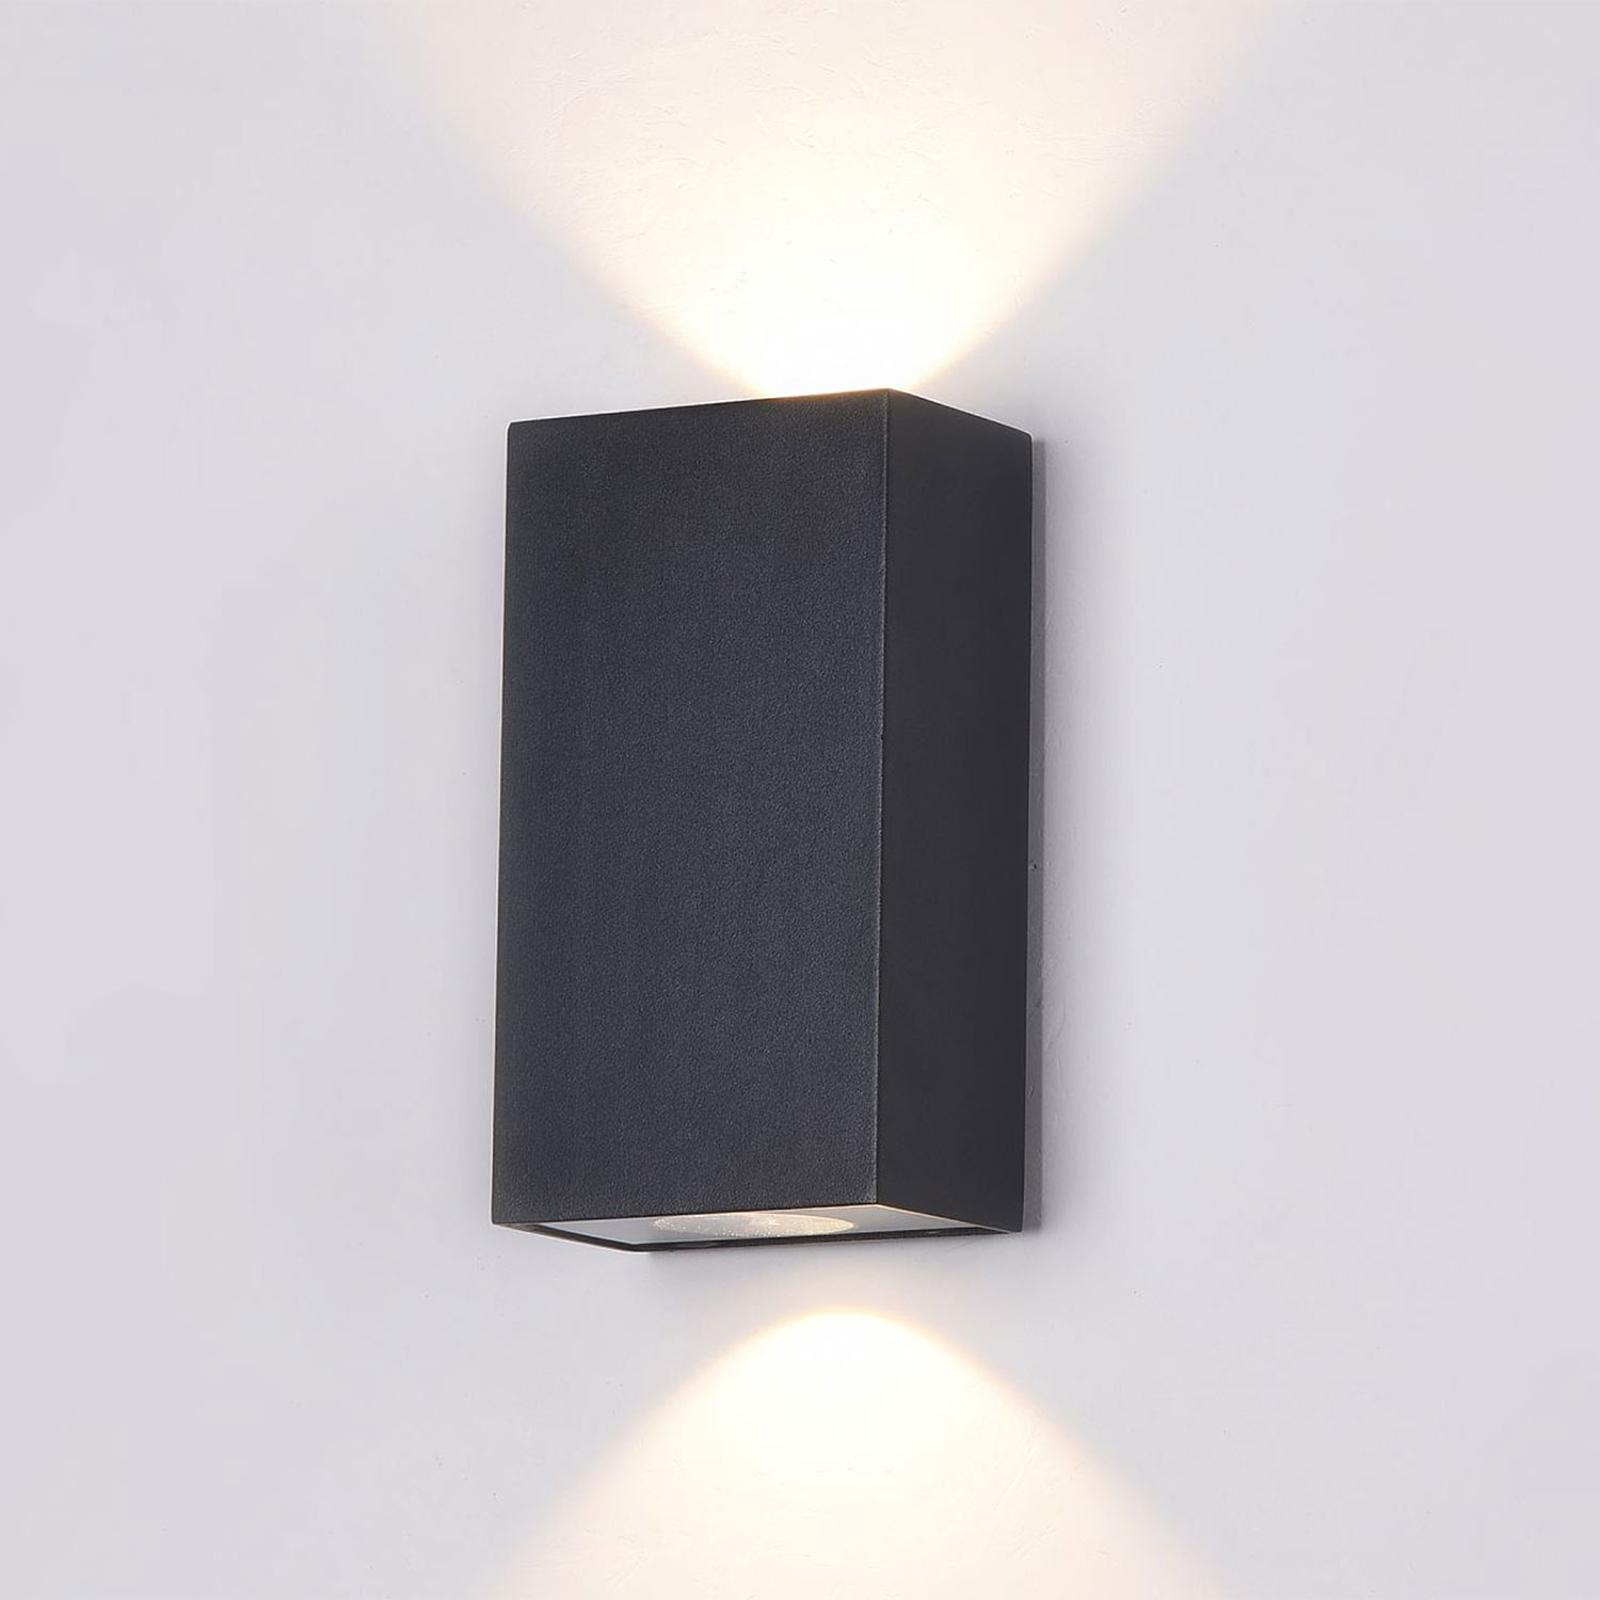 Buitenwandlamp Times Square, 9x16cm zwart